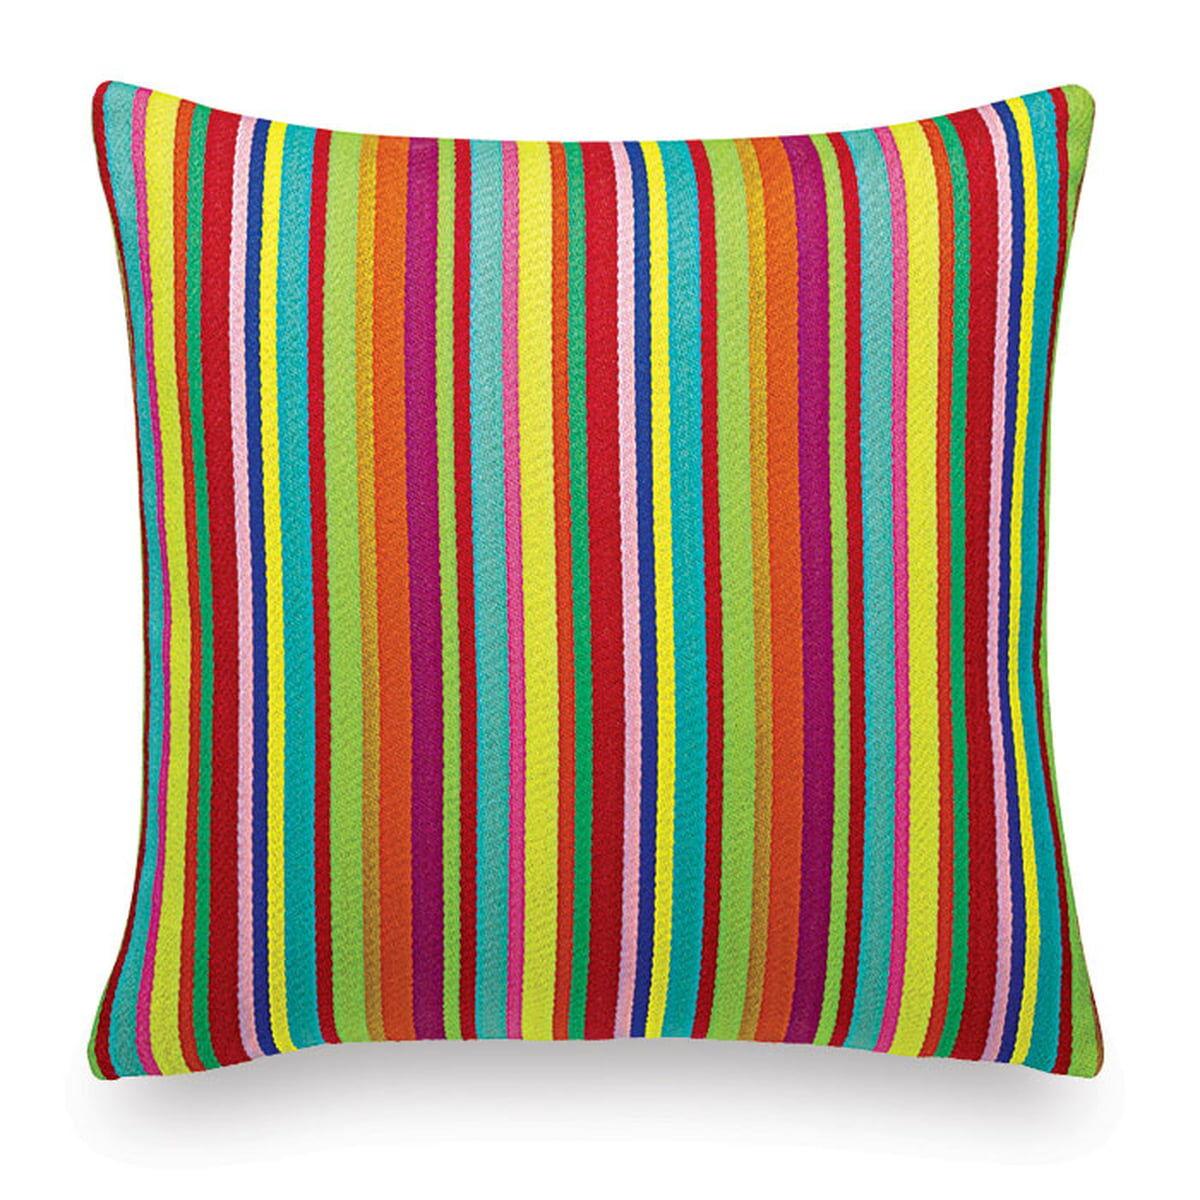 Vitra - Coussin Classic Maharam Millerstripe multicolored bright